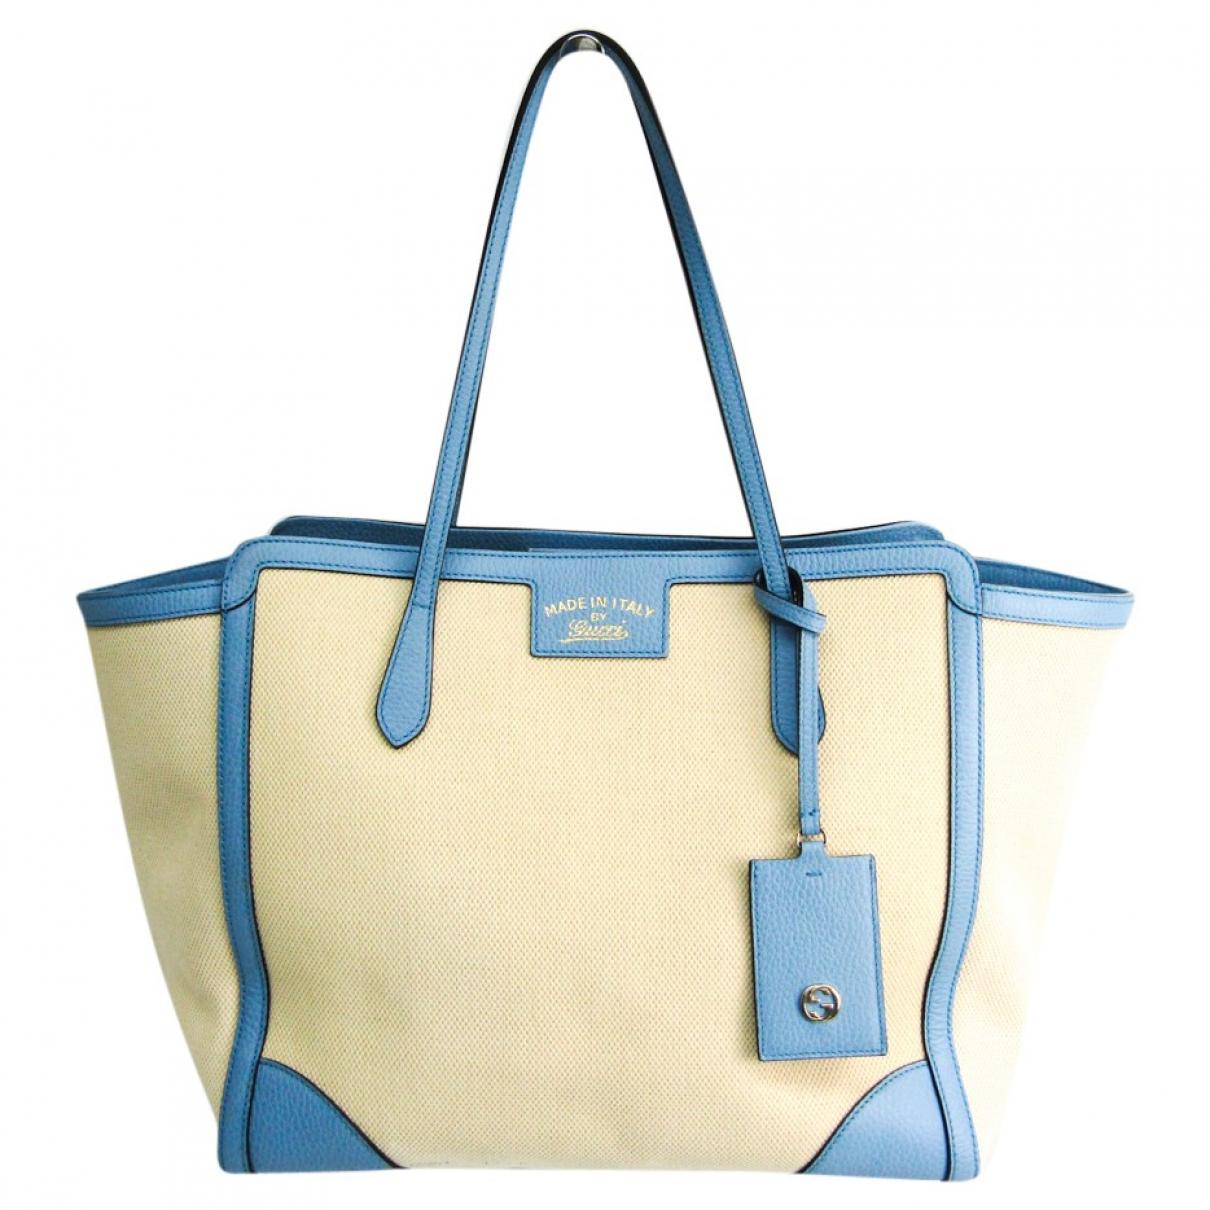 Gucci \N Handtasche in  Blau Leder